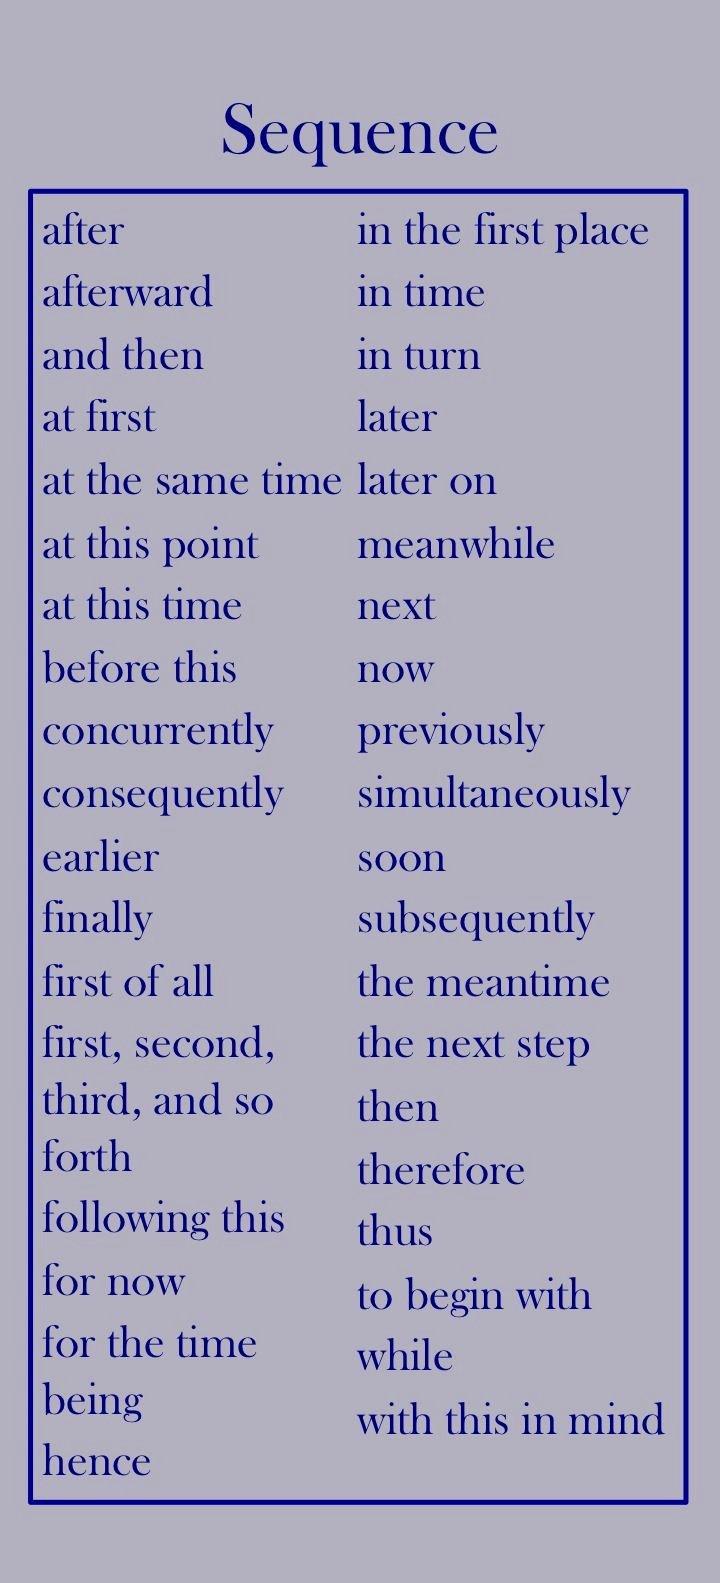 Research Paper Transition Words Elegant 84 Best Images About Esl Grammar Connectors and